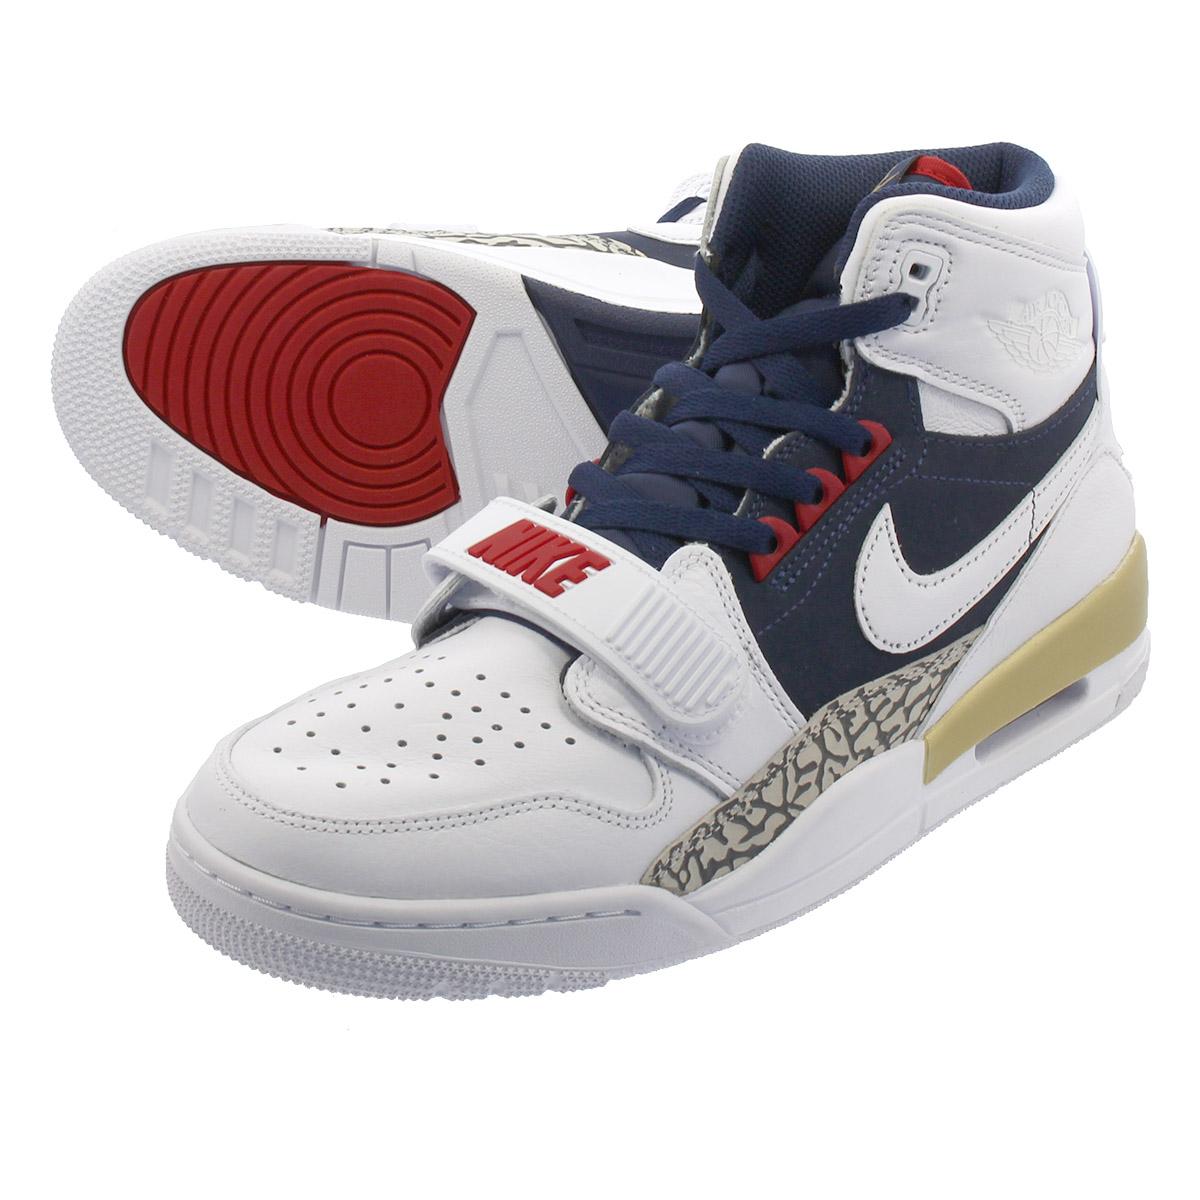 wholesale dealer f5b93 c5249 NIKE AIR JORDAN LEGACY 312 Nike Air Jordan Legacy 312 WHITE MIDNIGHT NAVY VARSITY  RED av3922-101